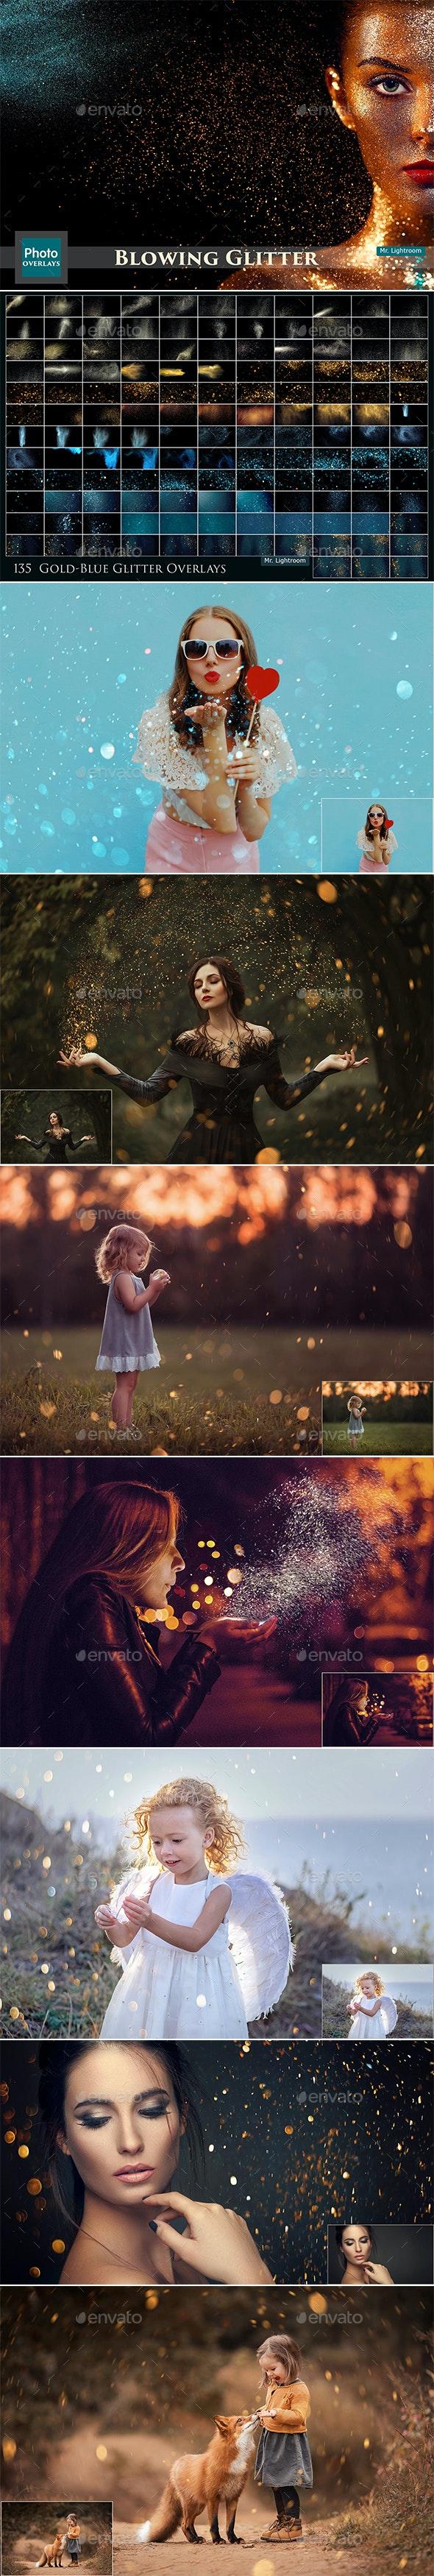 135 Glitter Overlays - Artistic Photo Templates